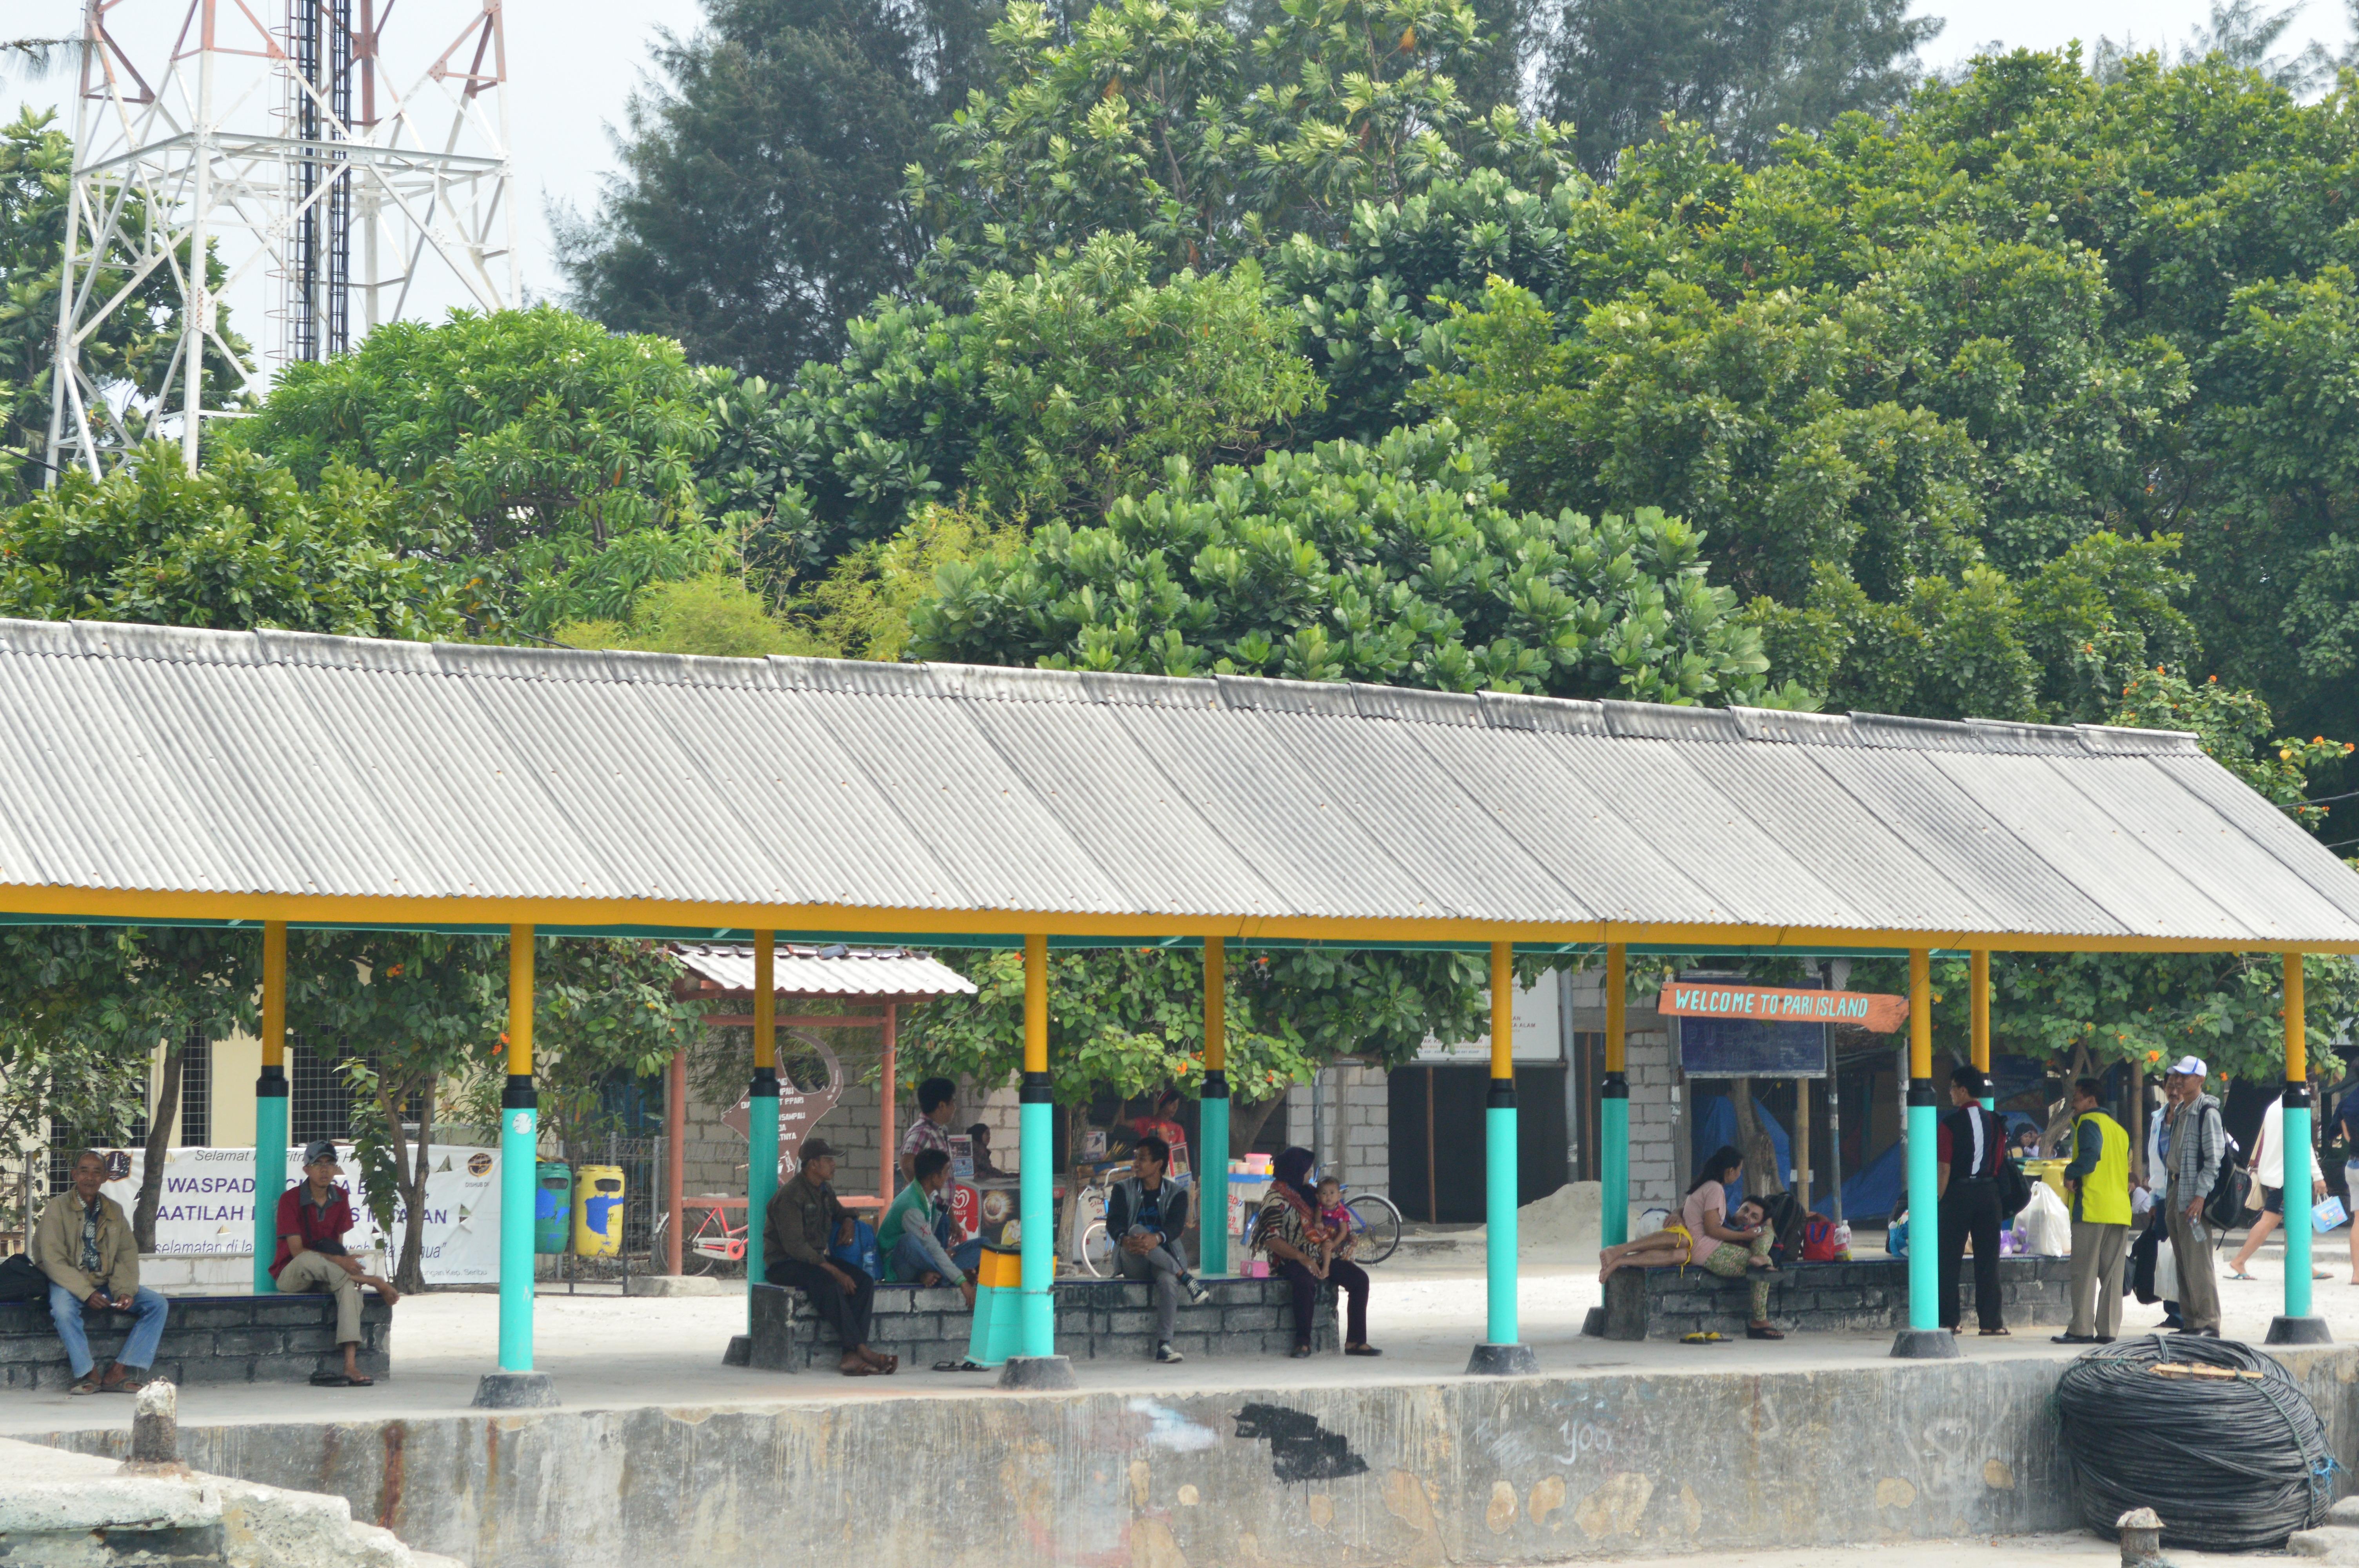 Rippda Cakrawala Pengembangan Kspn Kepulauan Seribu Sebagai Destinasi Pariwisata Bagi